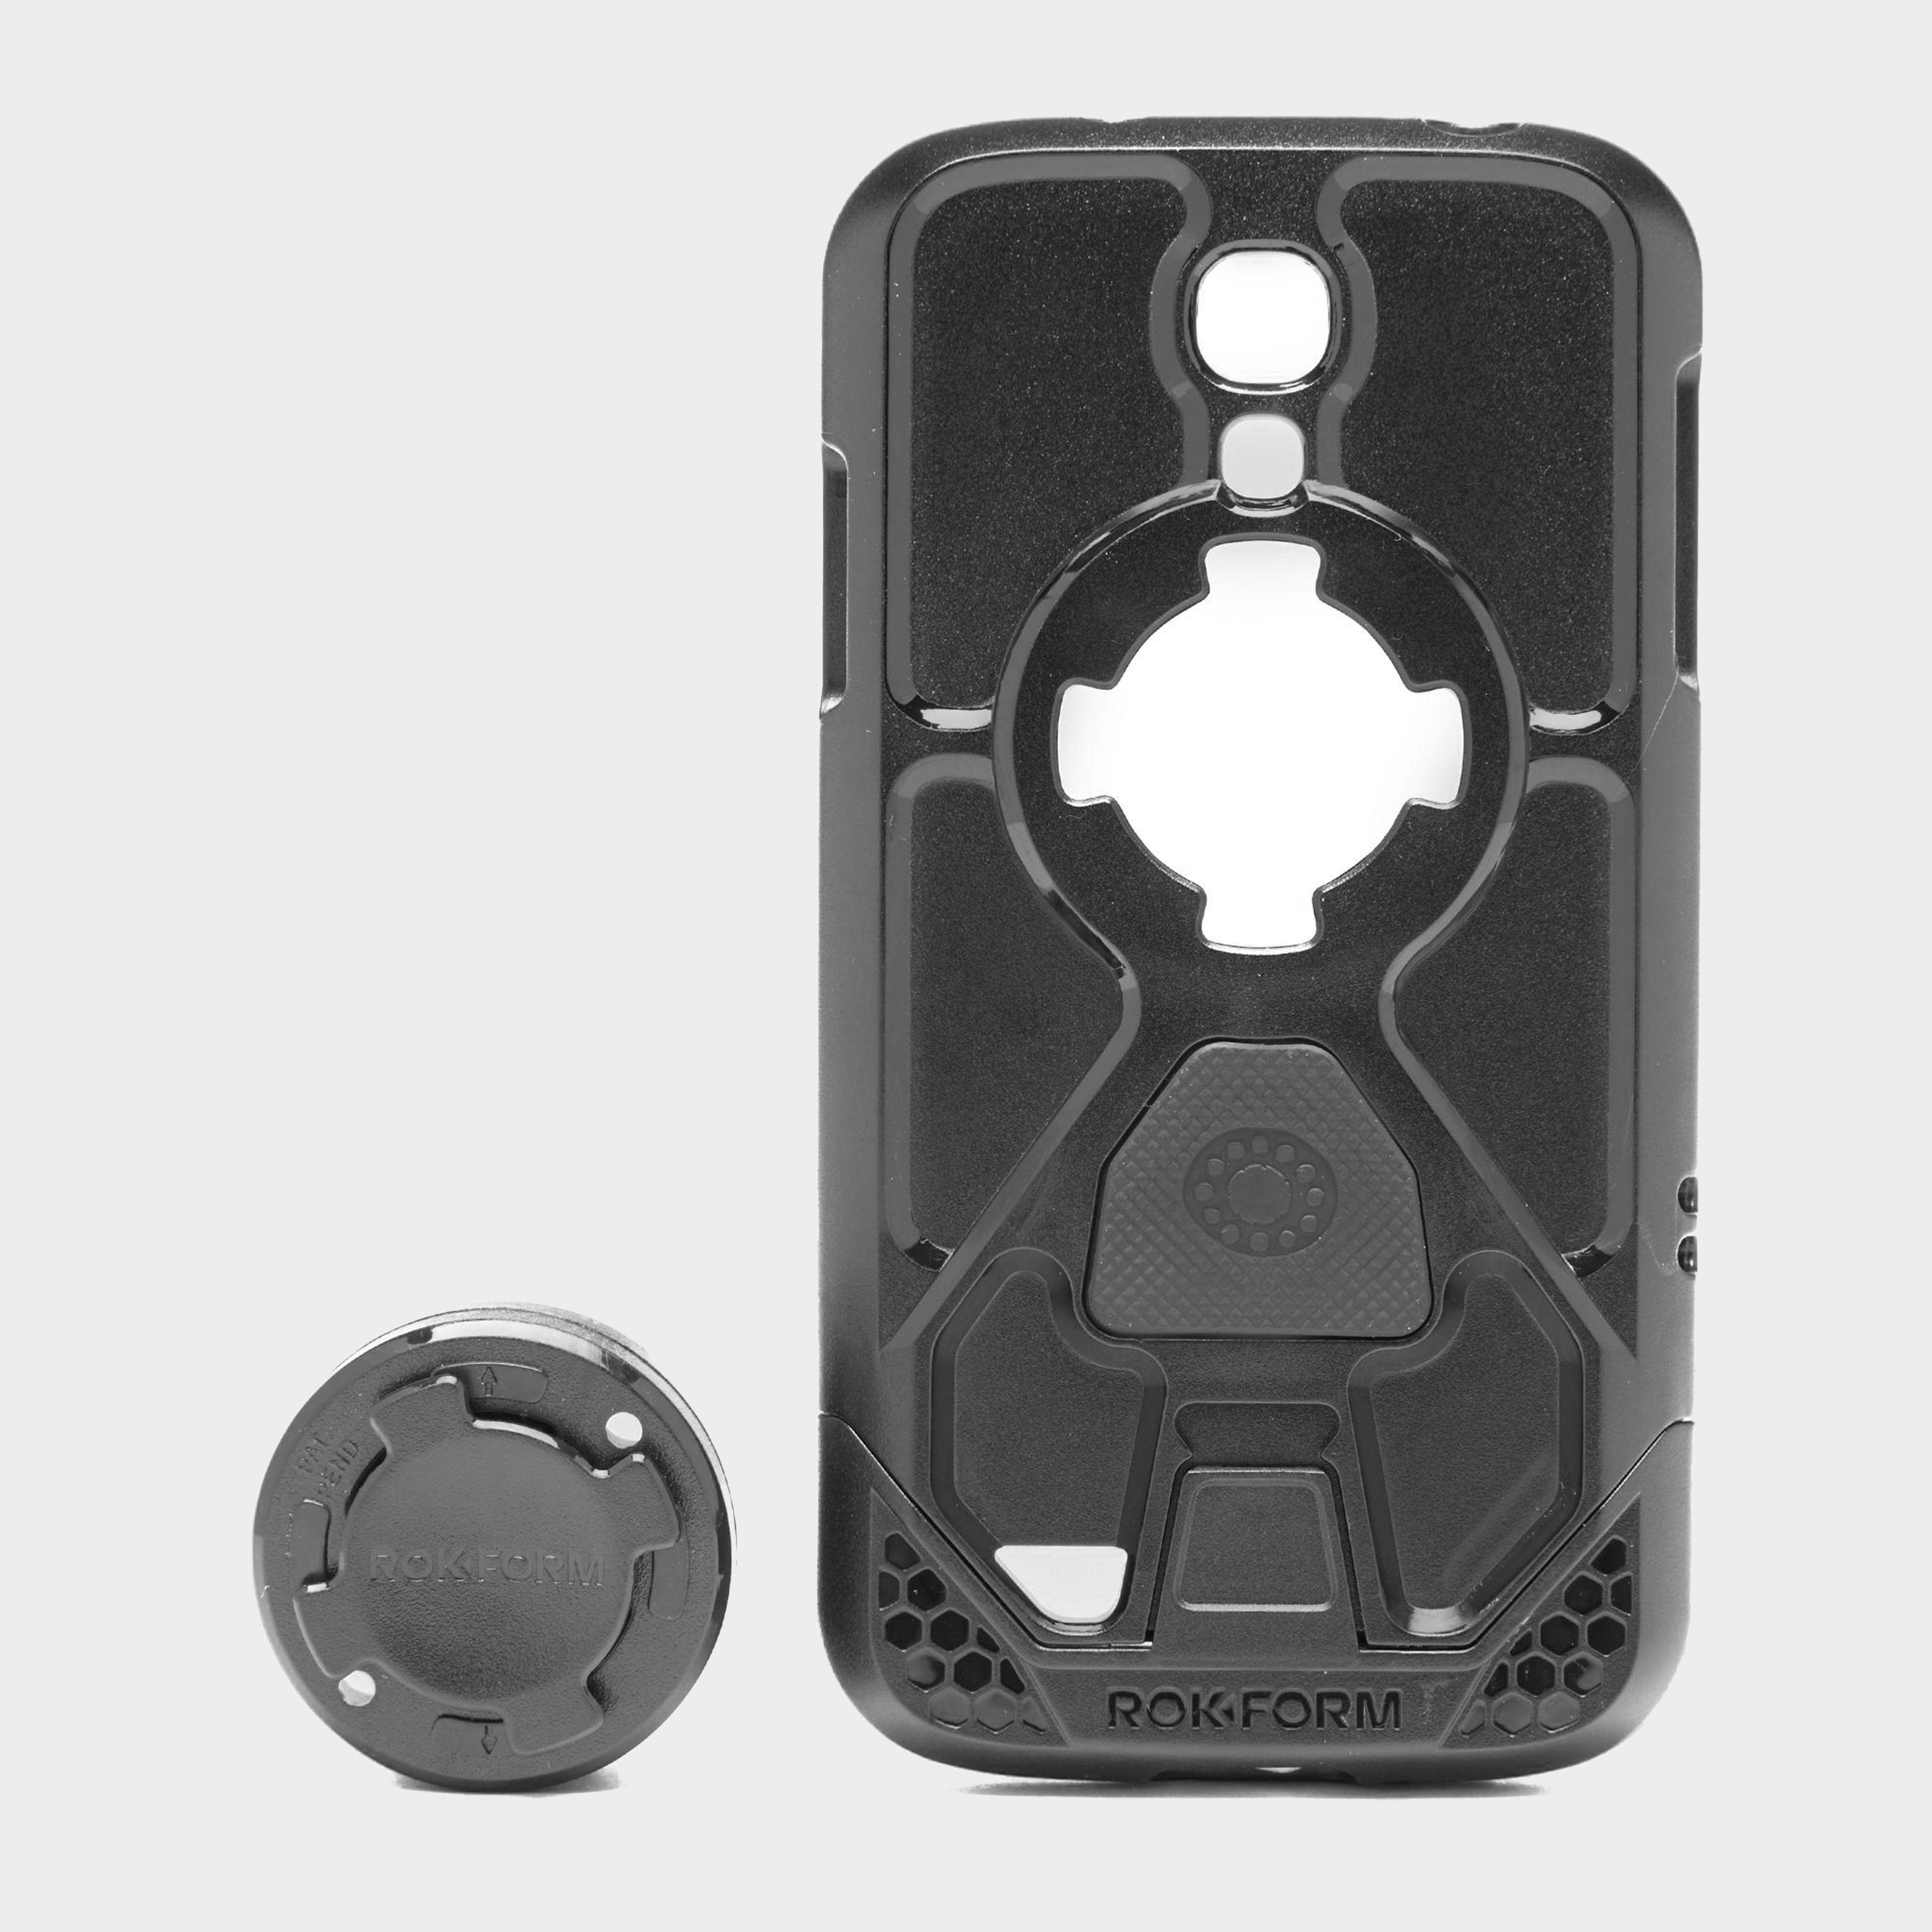 ROKFORM Samsung Galaxy S4 Mountable Case